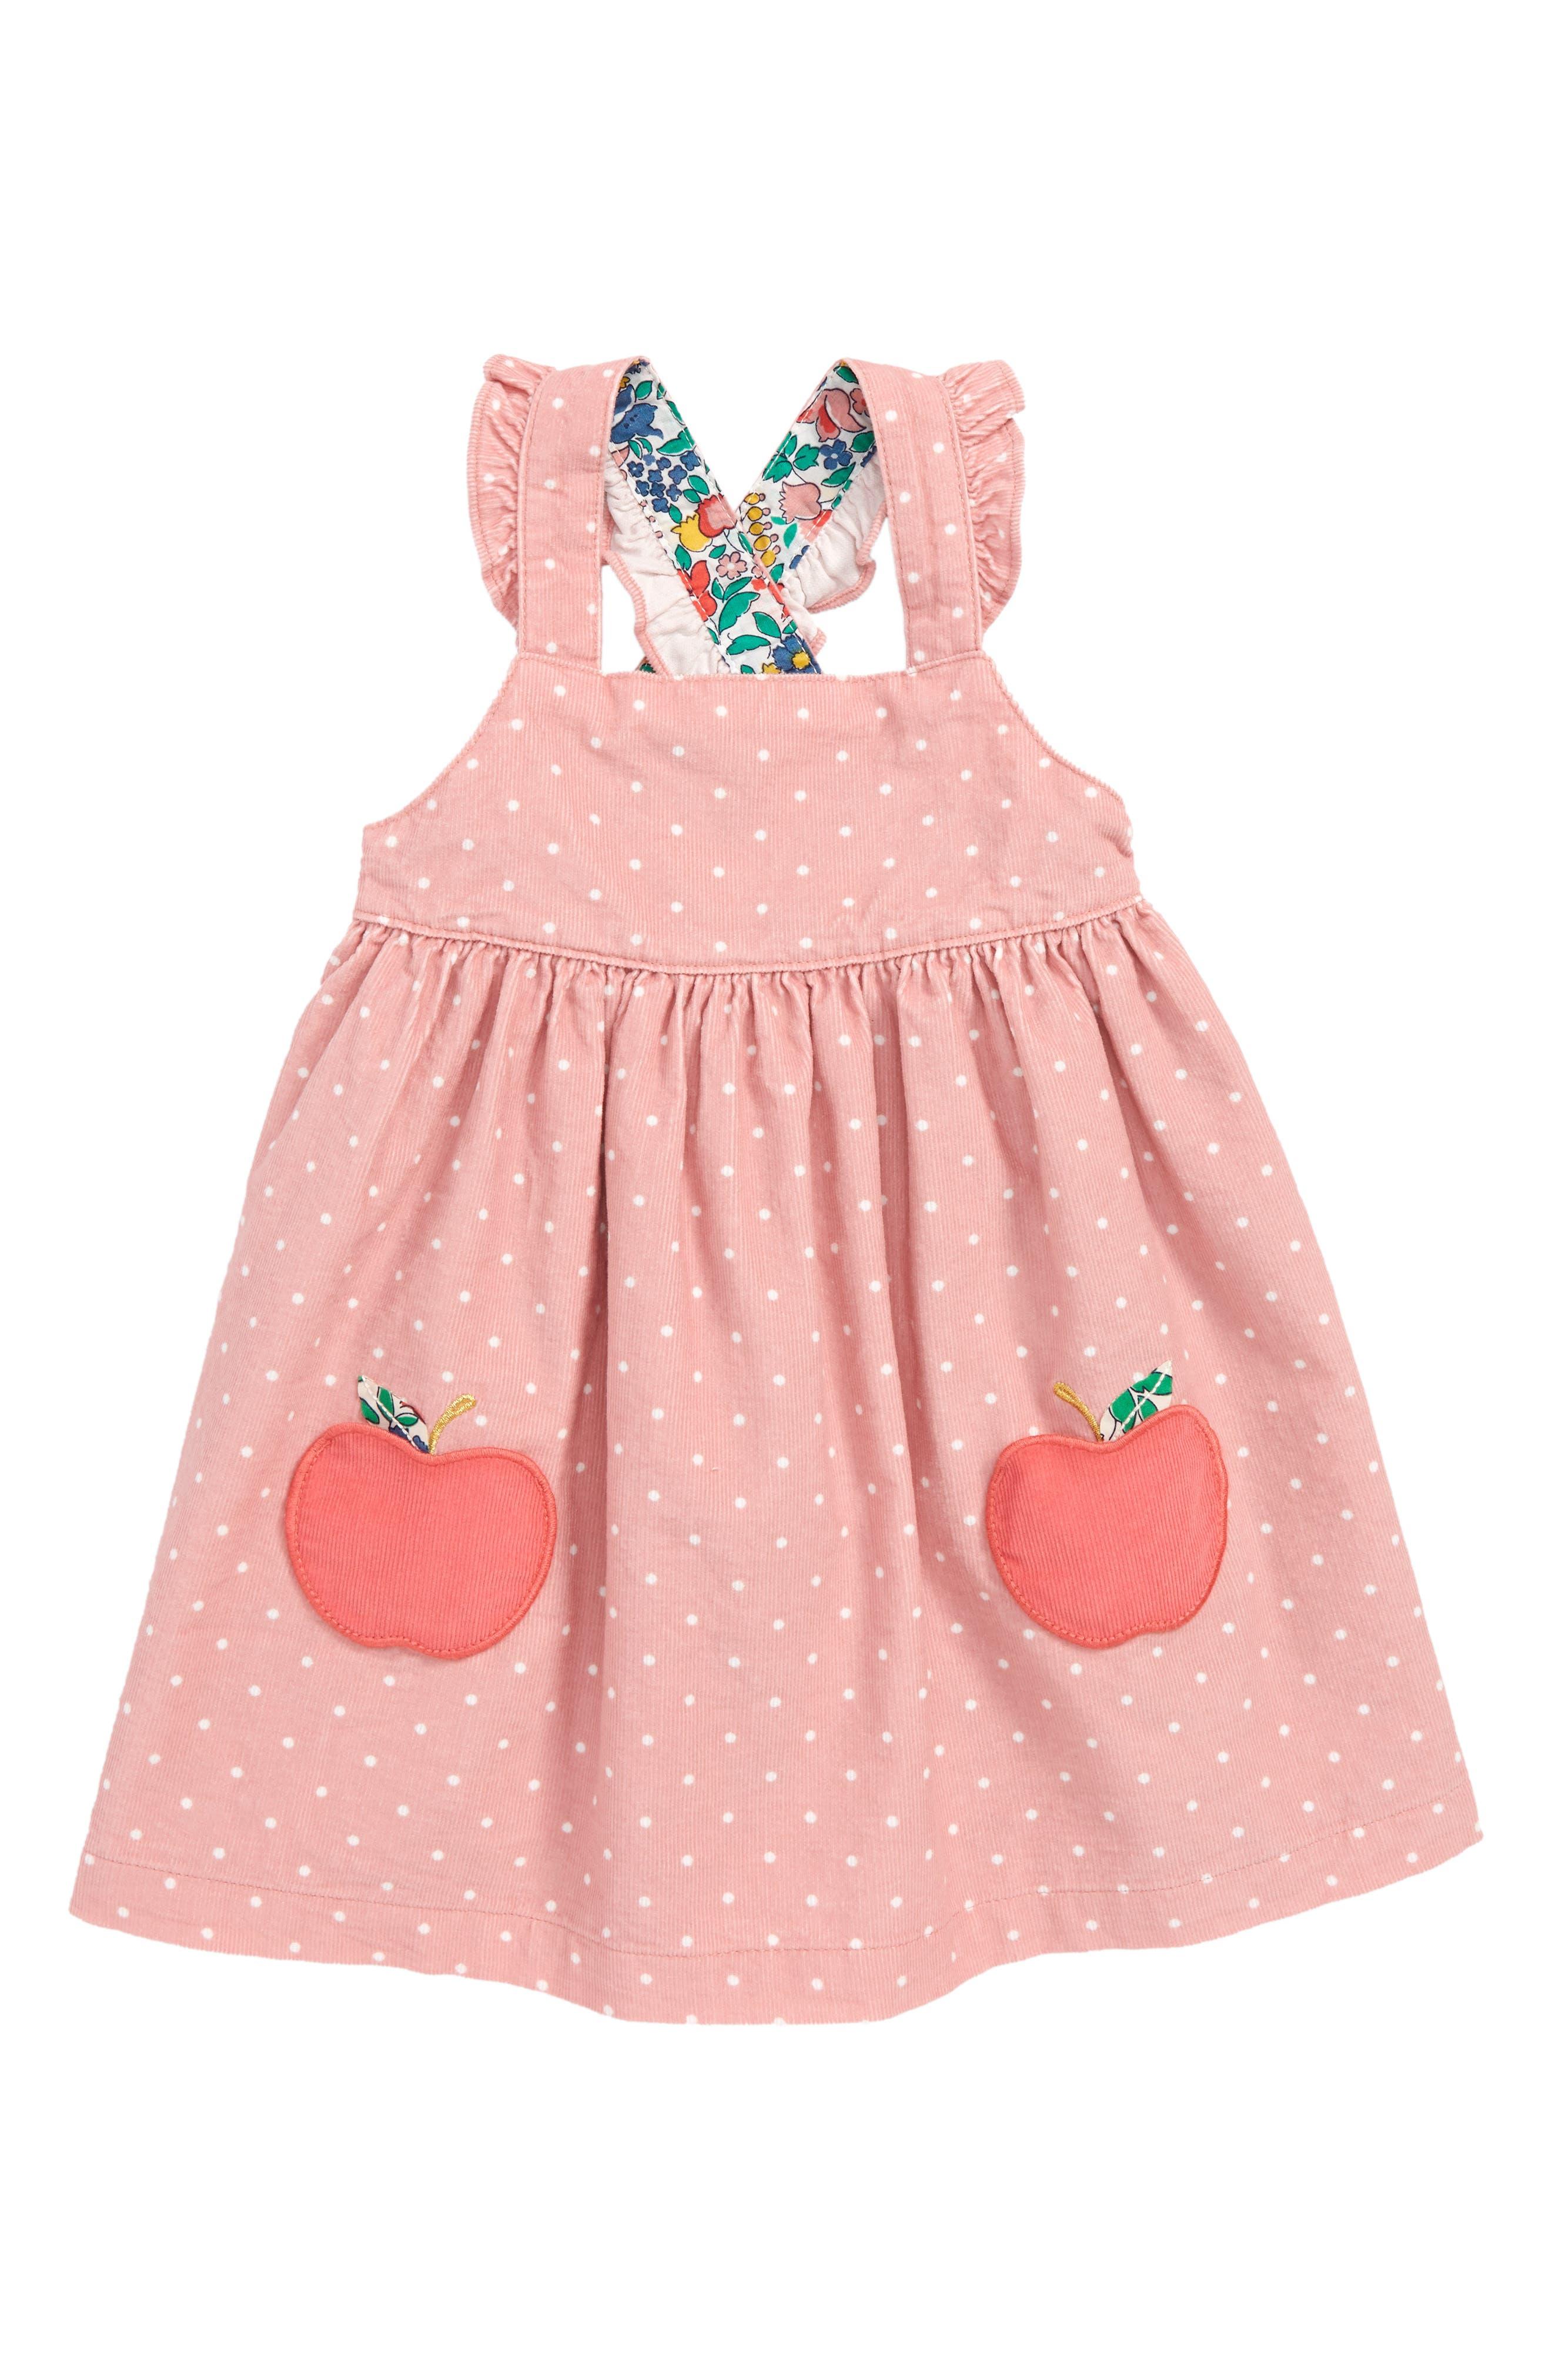 Appliqué Pinafore Dress,                             Main thumbnail 1, color,                             ALMOND BLOSSOM/ APPLES